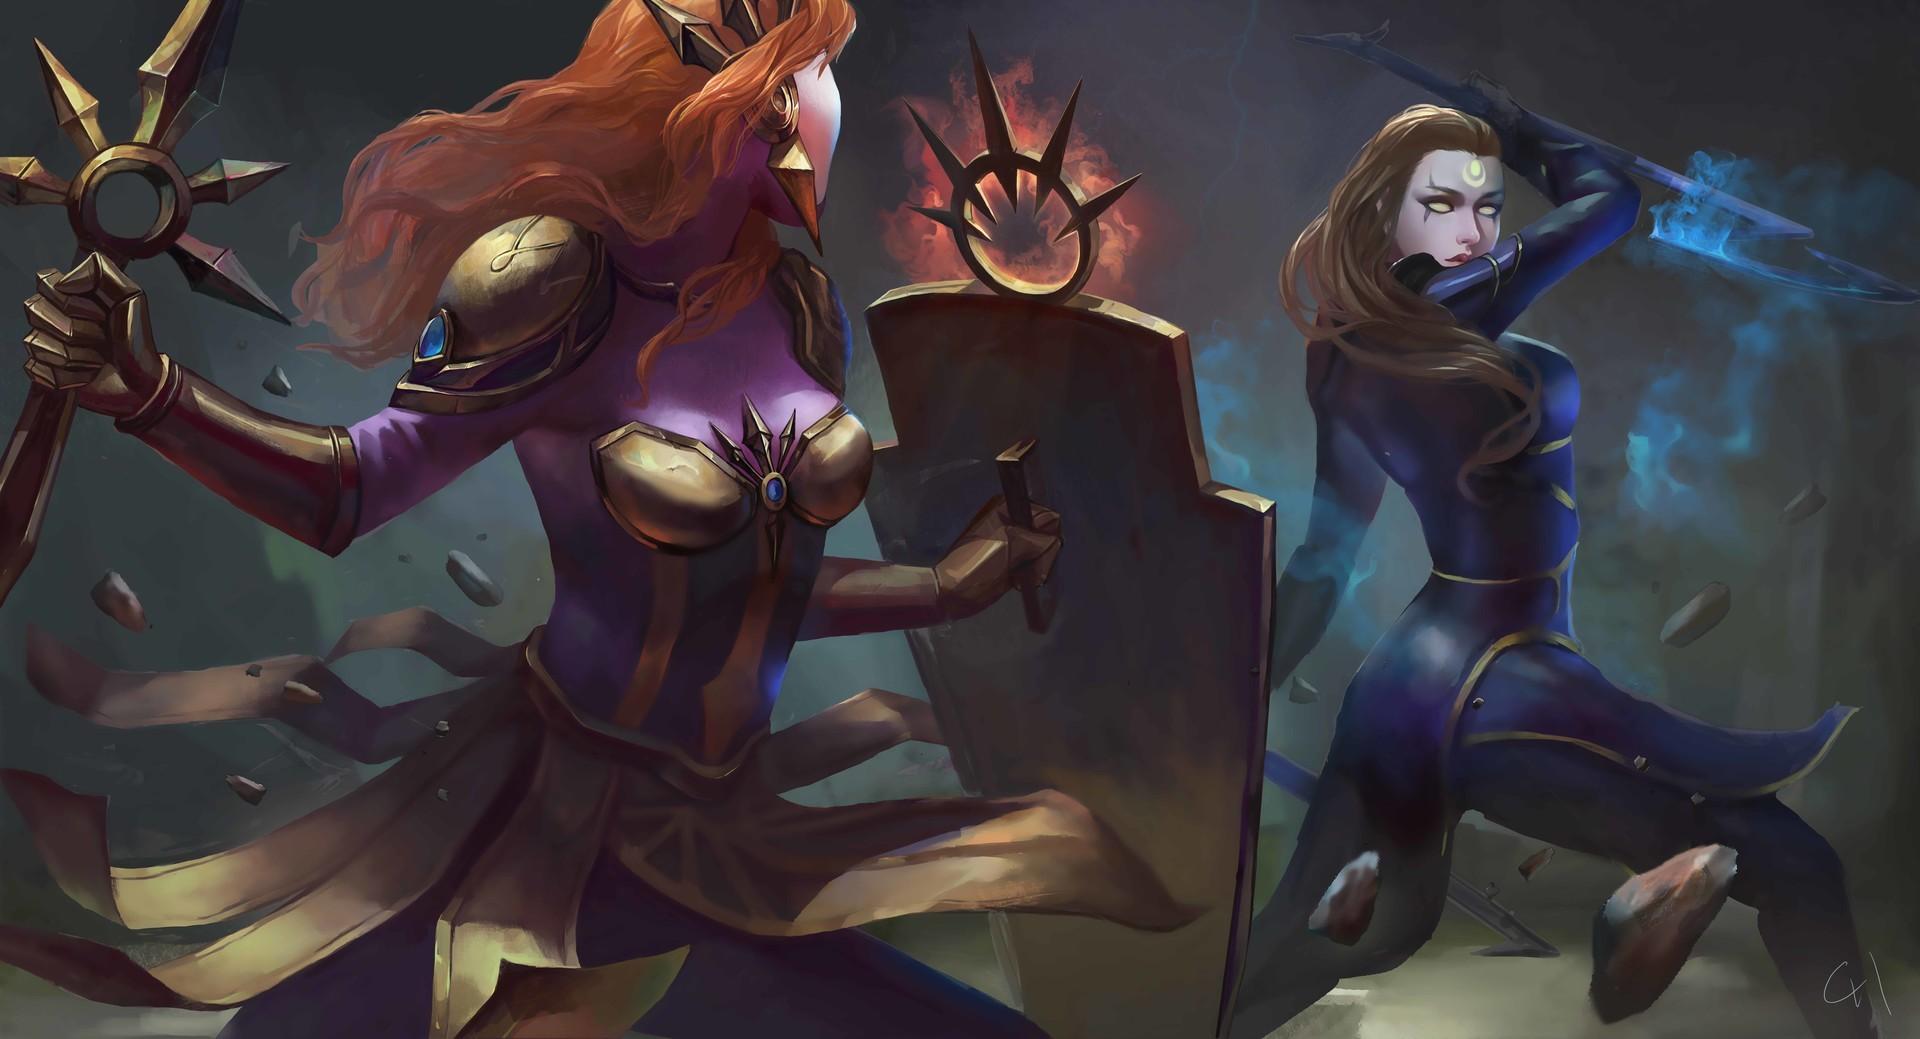 Wallpaper Illustration Anime League Of Legends Leona League